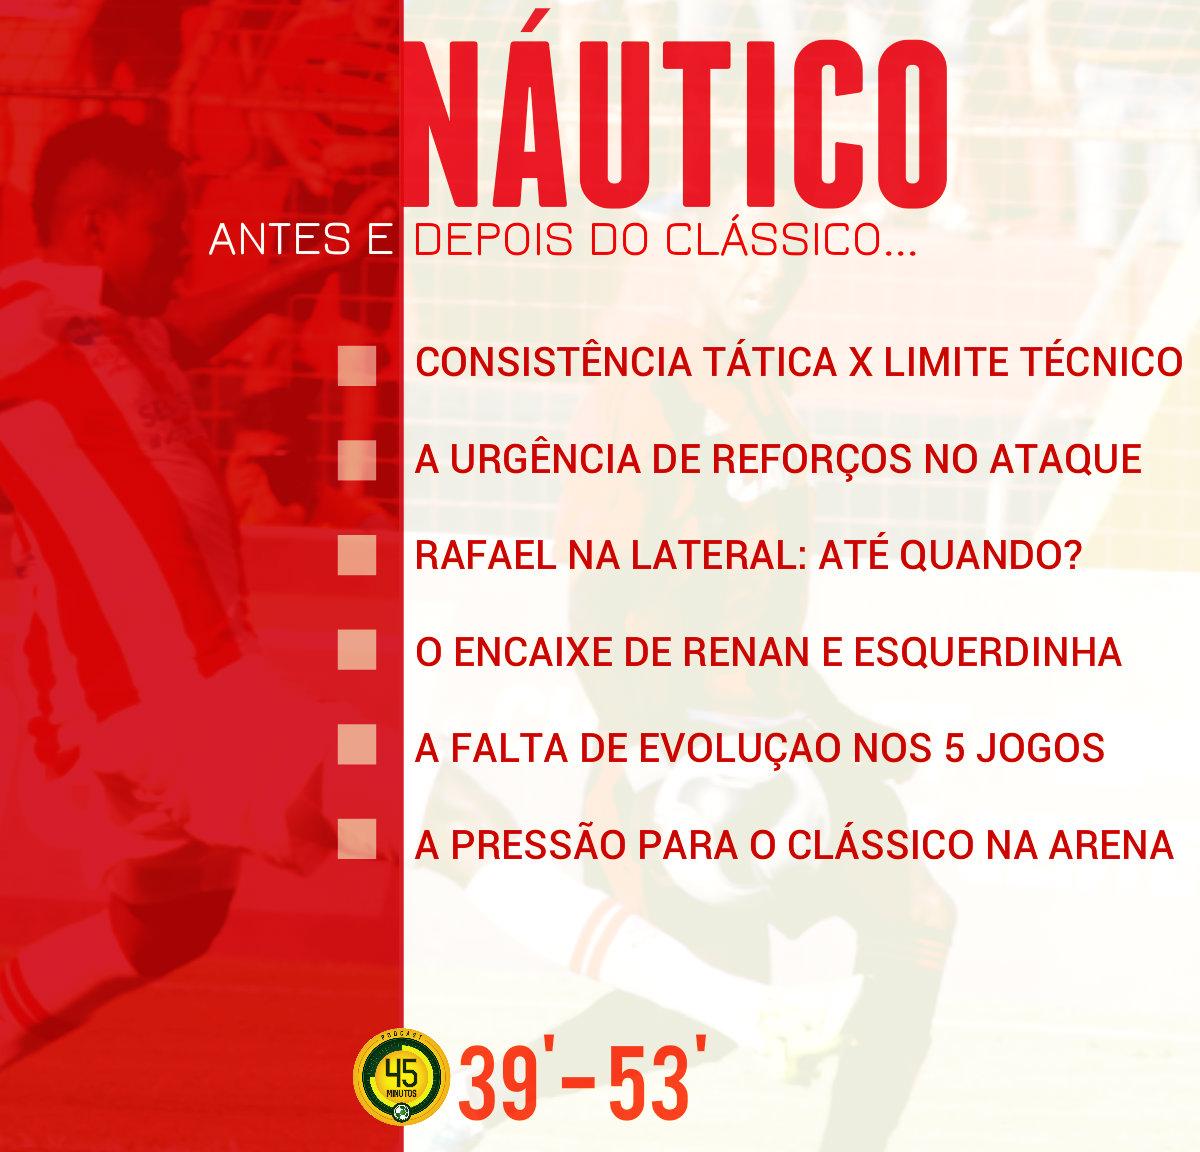 45_220_nautico